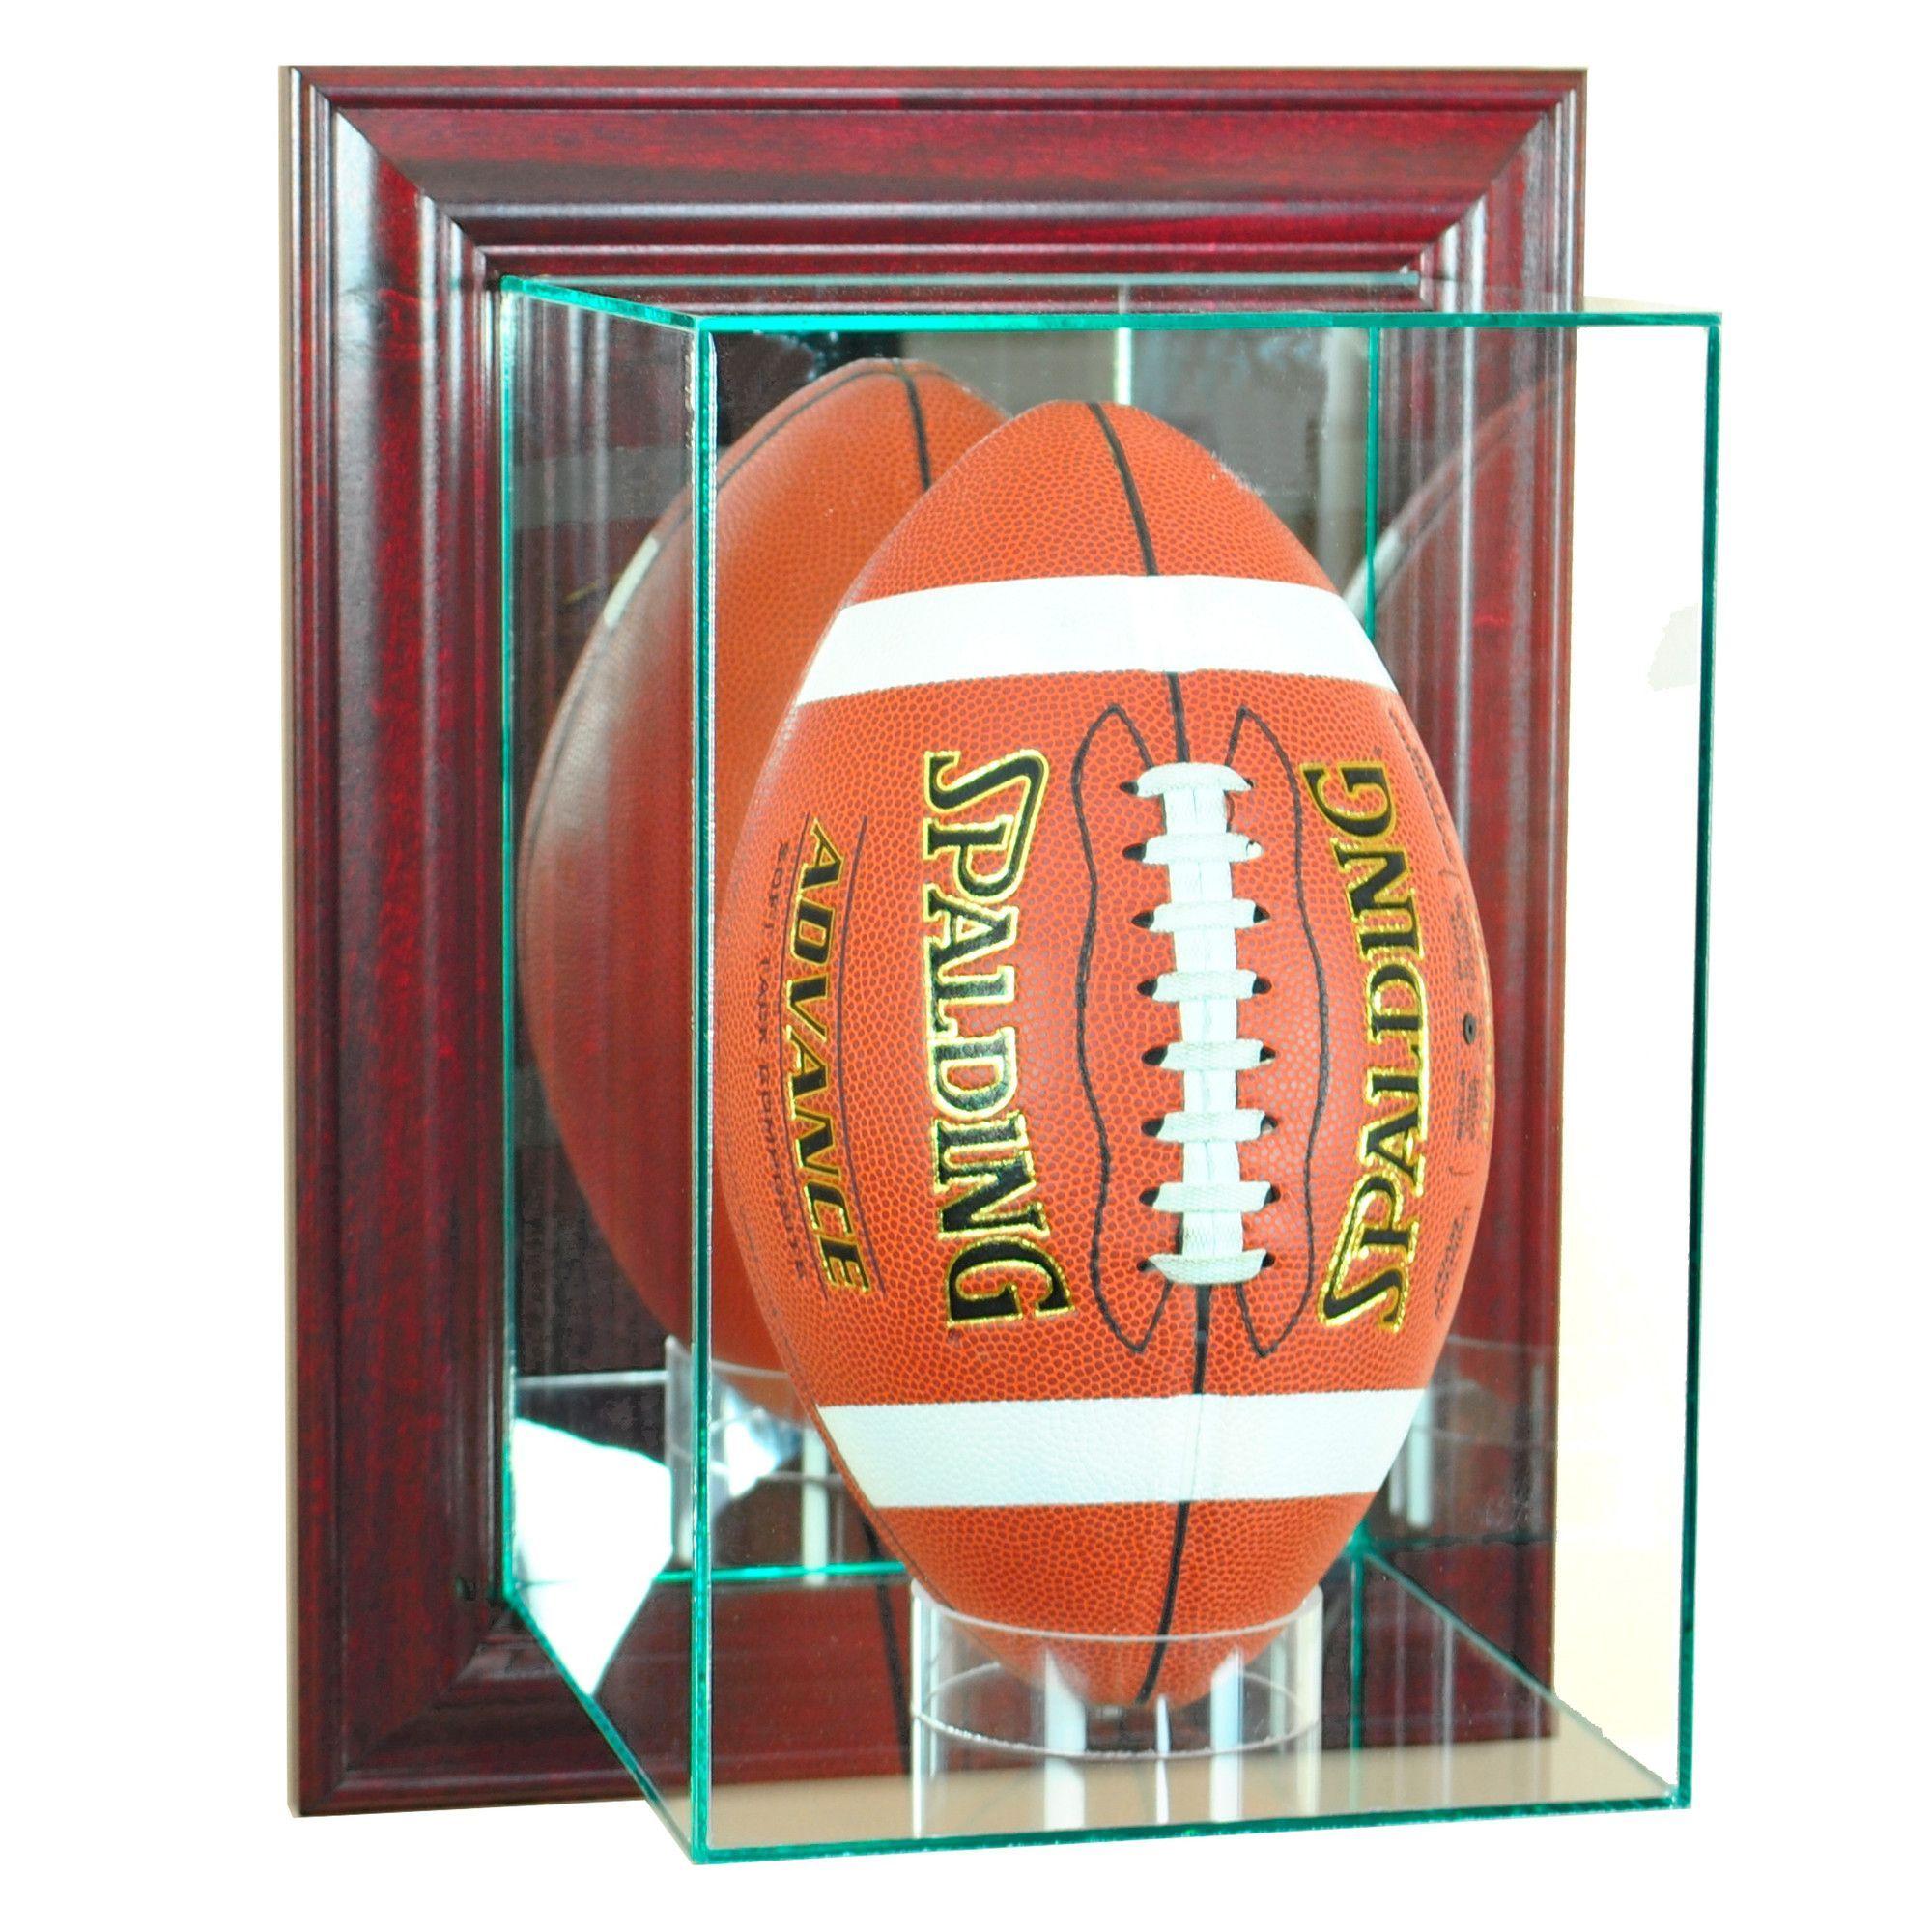 Wall Mounted Upright Football Glass Display Case Football Display Cases Wall Mounted Display Case